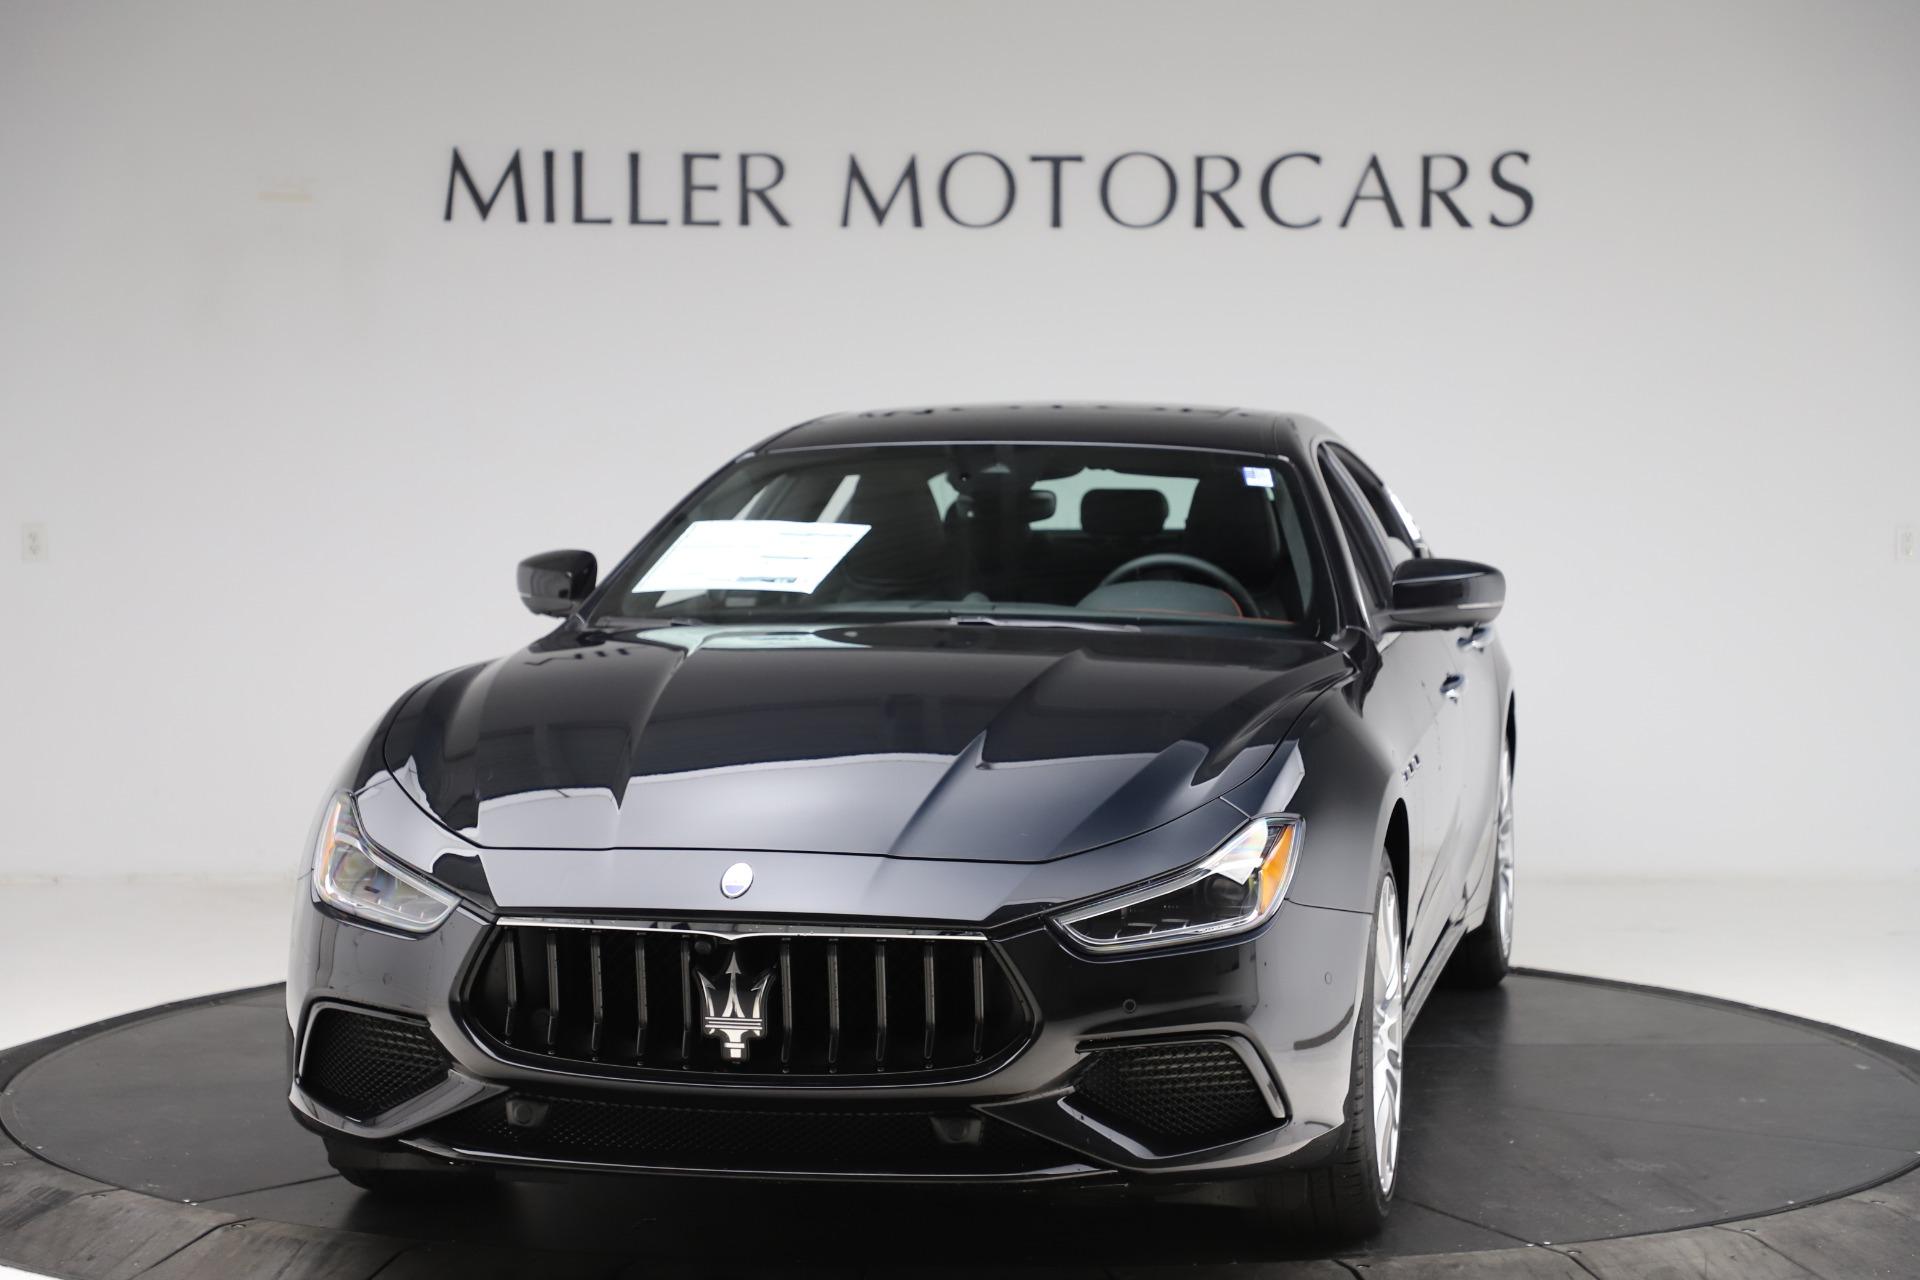 New 2021 Maserati Ghibli S Q4 GranSport for sale $98,035 at Bugatti of Greenwich in Greenwich CT 06830 1